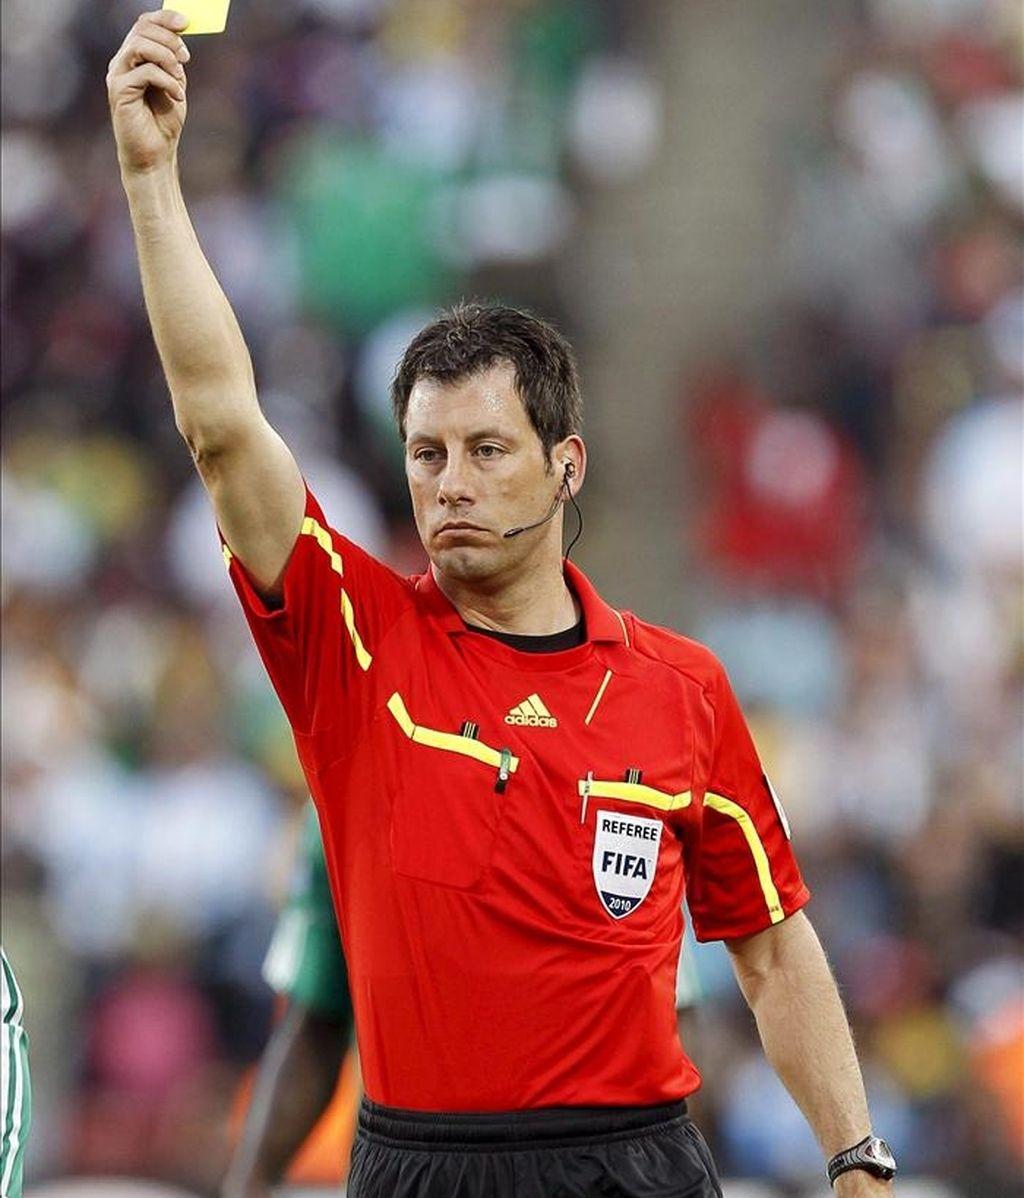 El árbitro alemán Wolfgang Stark. EFE/Archivo